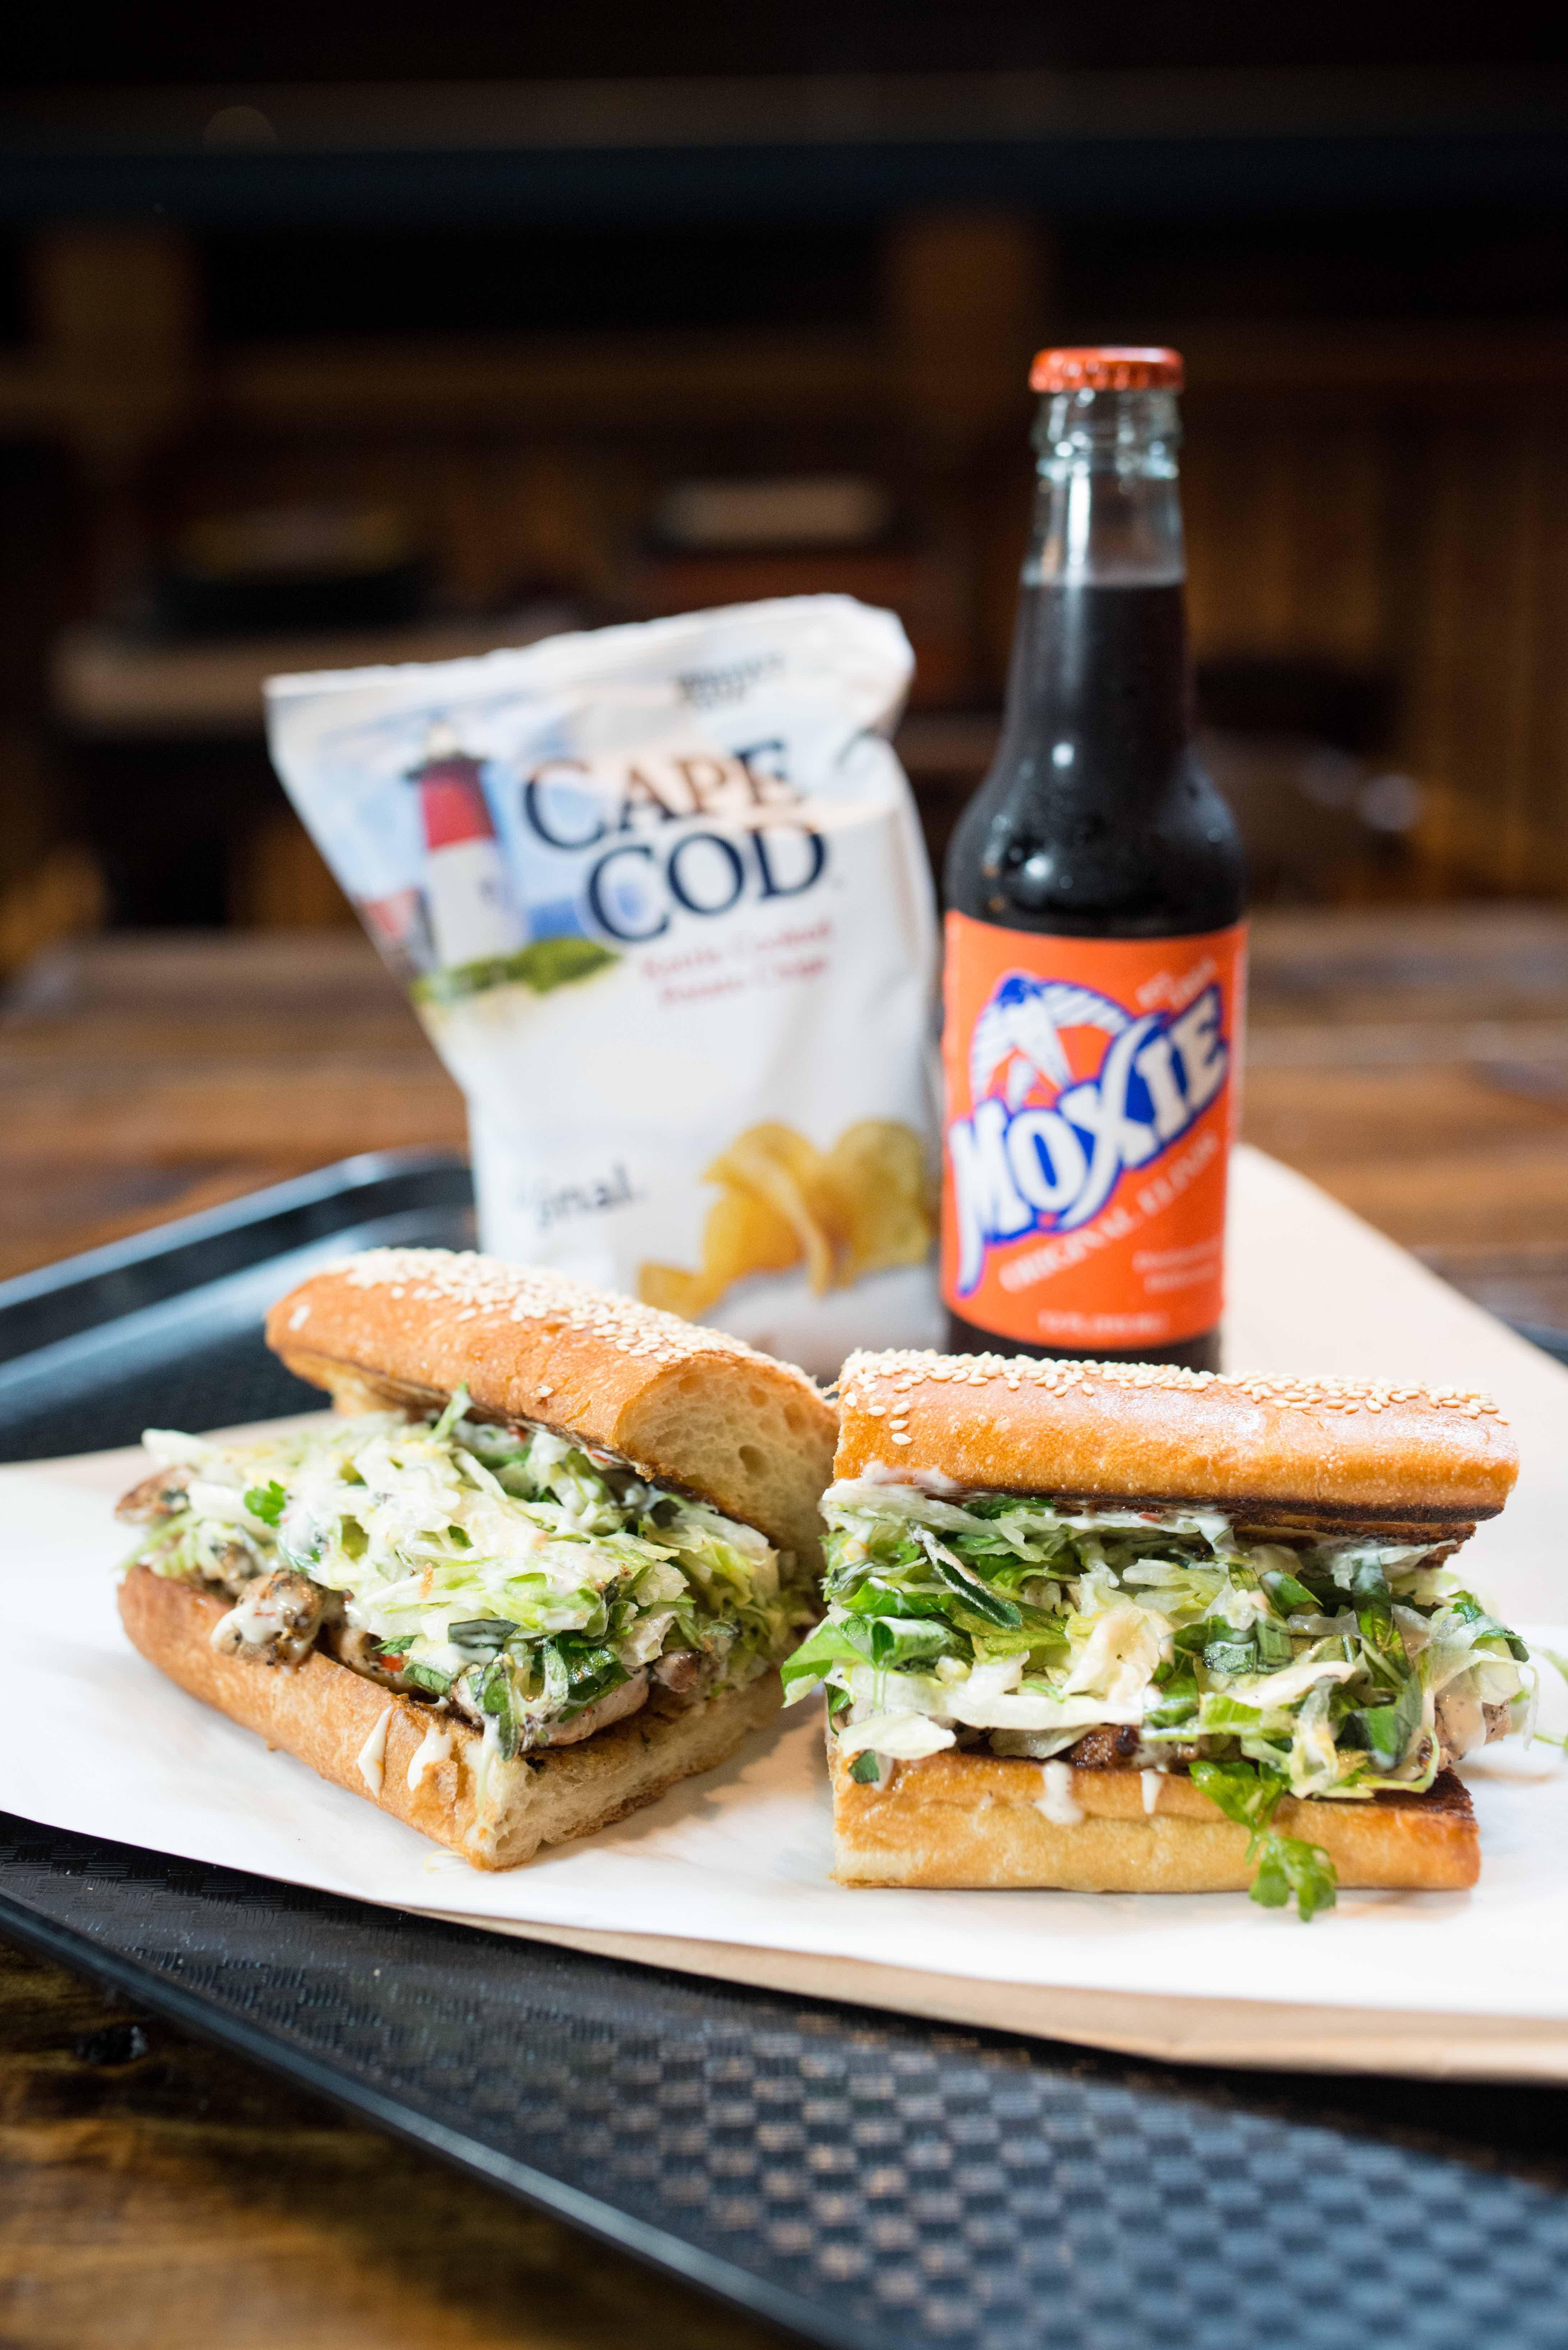 Ticonderoga Club's spiedie, with Moxie soda and Cape Cod chips.